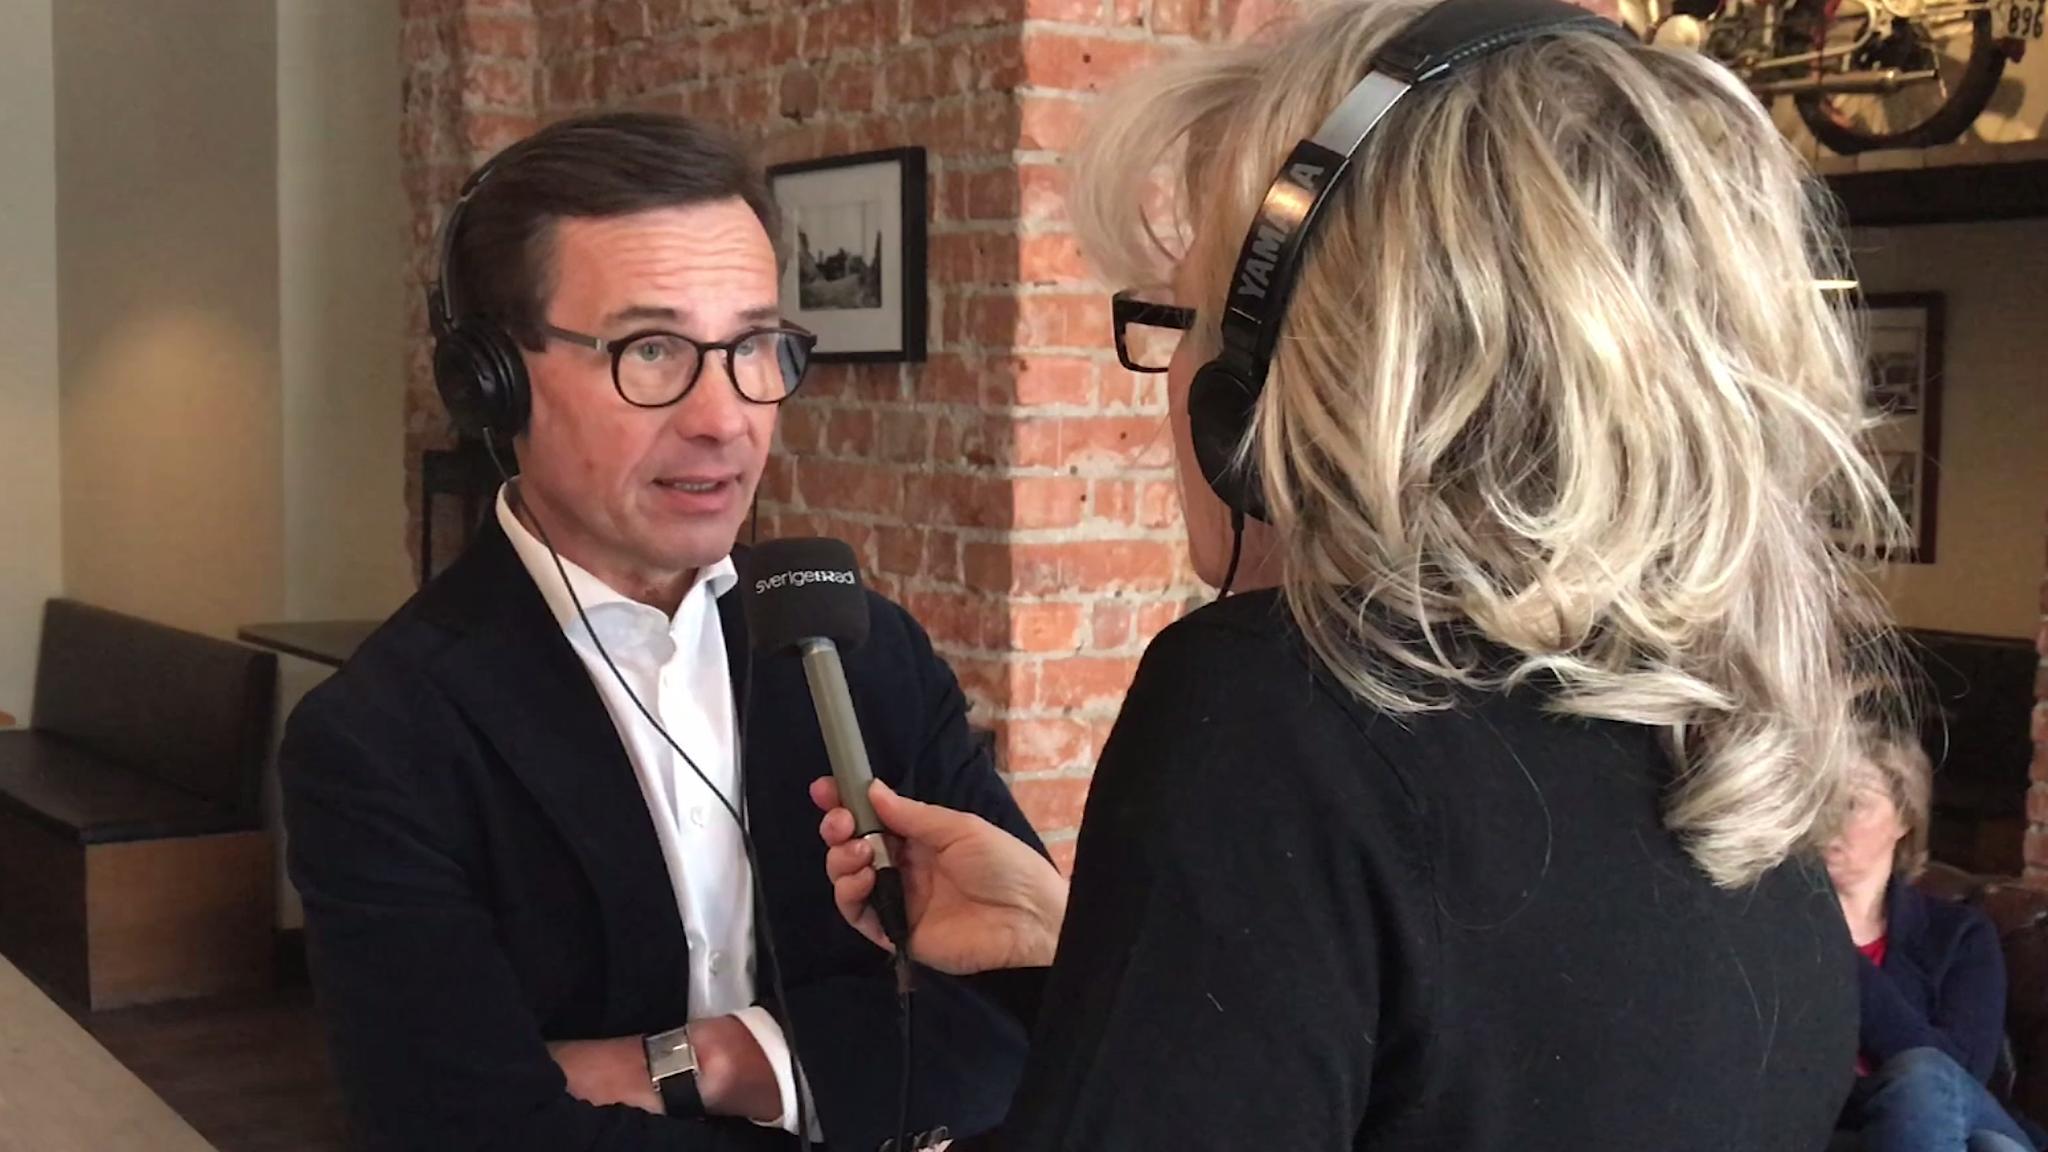 Ulf Kristersson intervjuas.